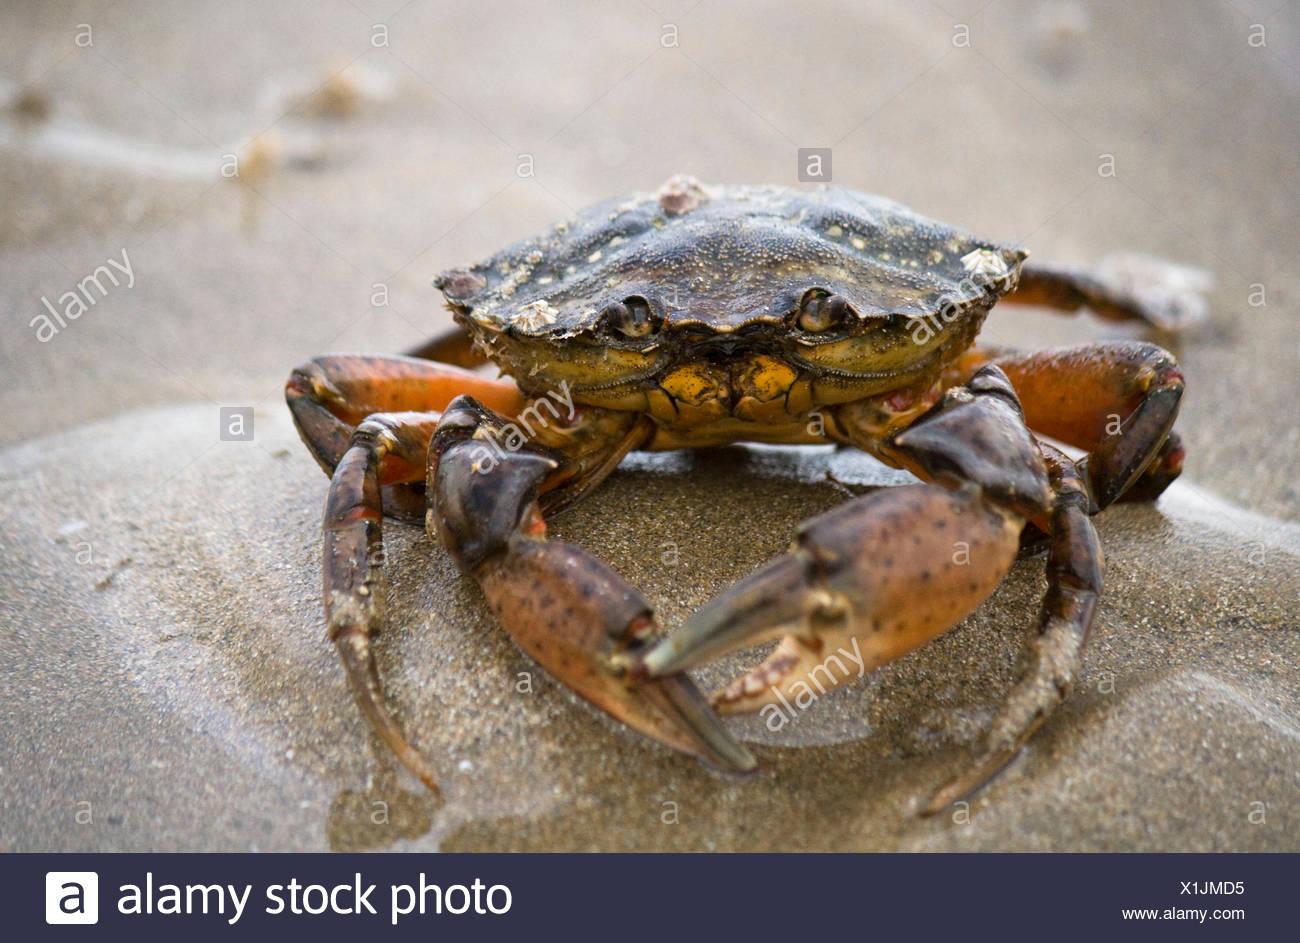 Green crab - Stock Image